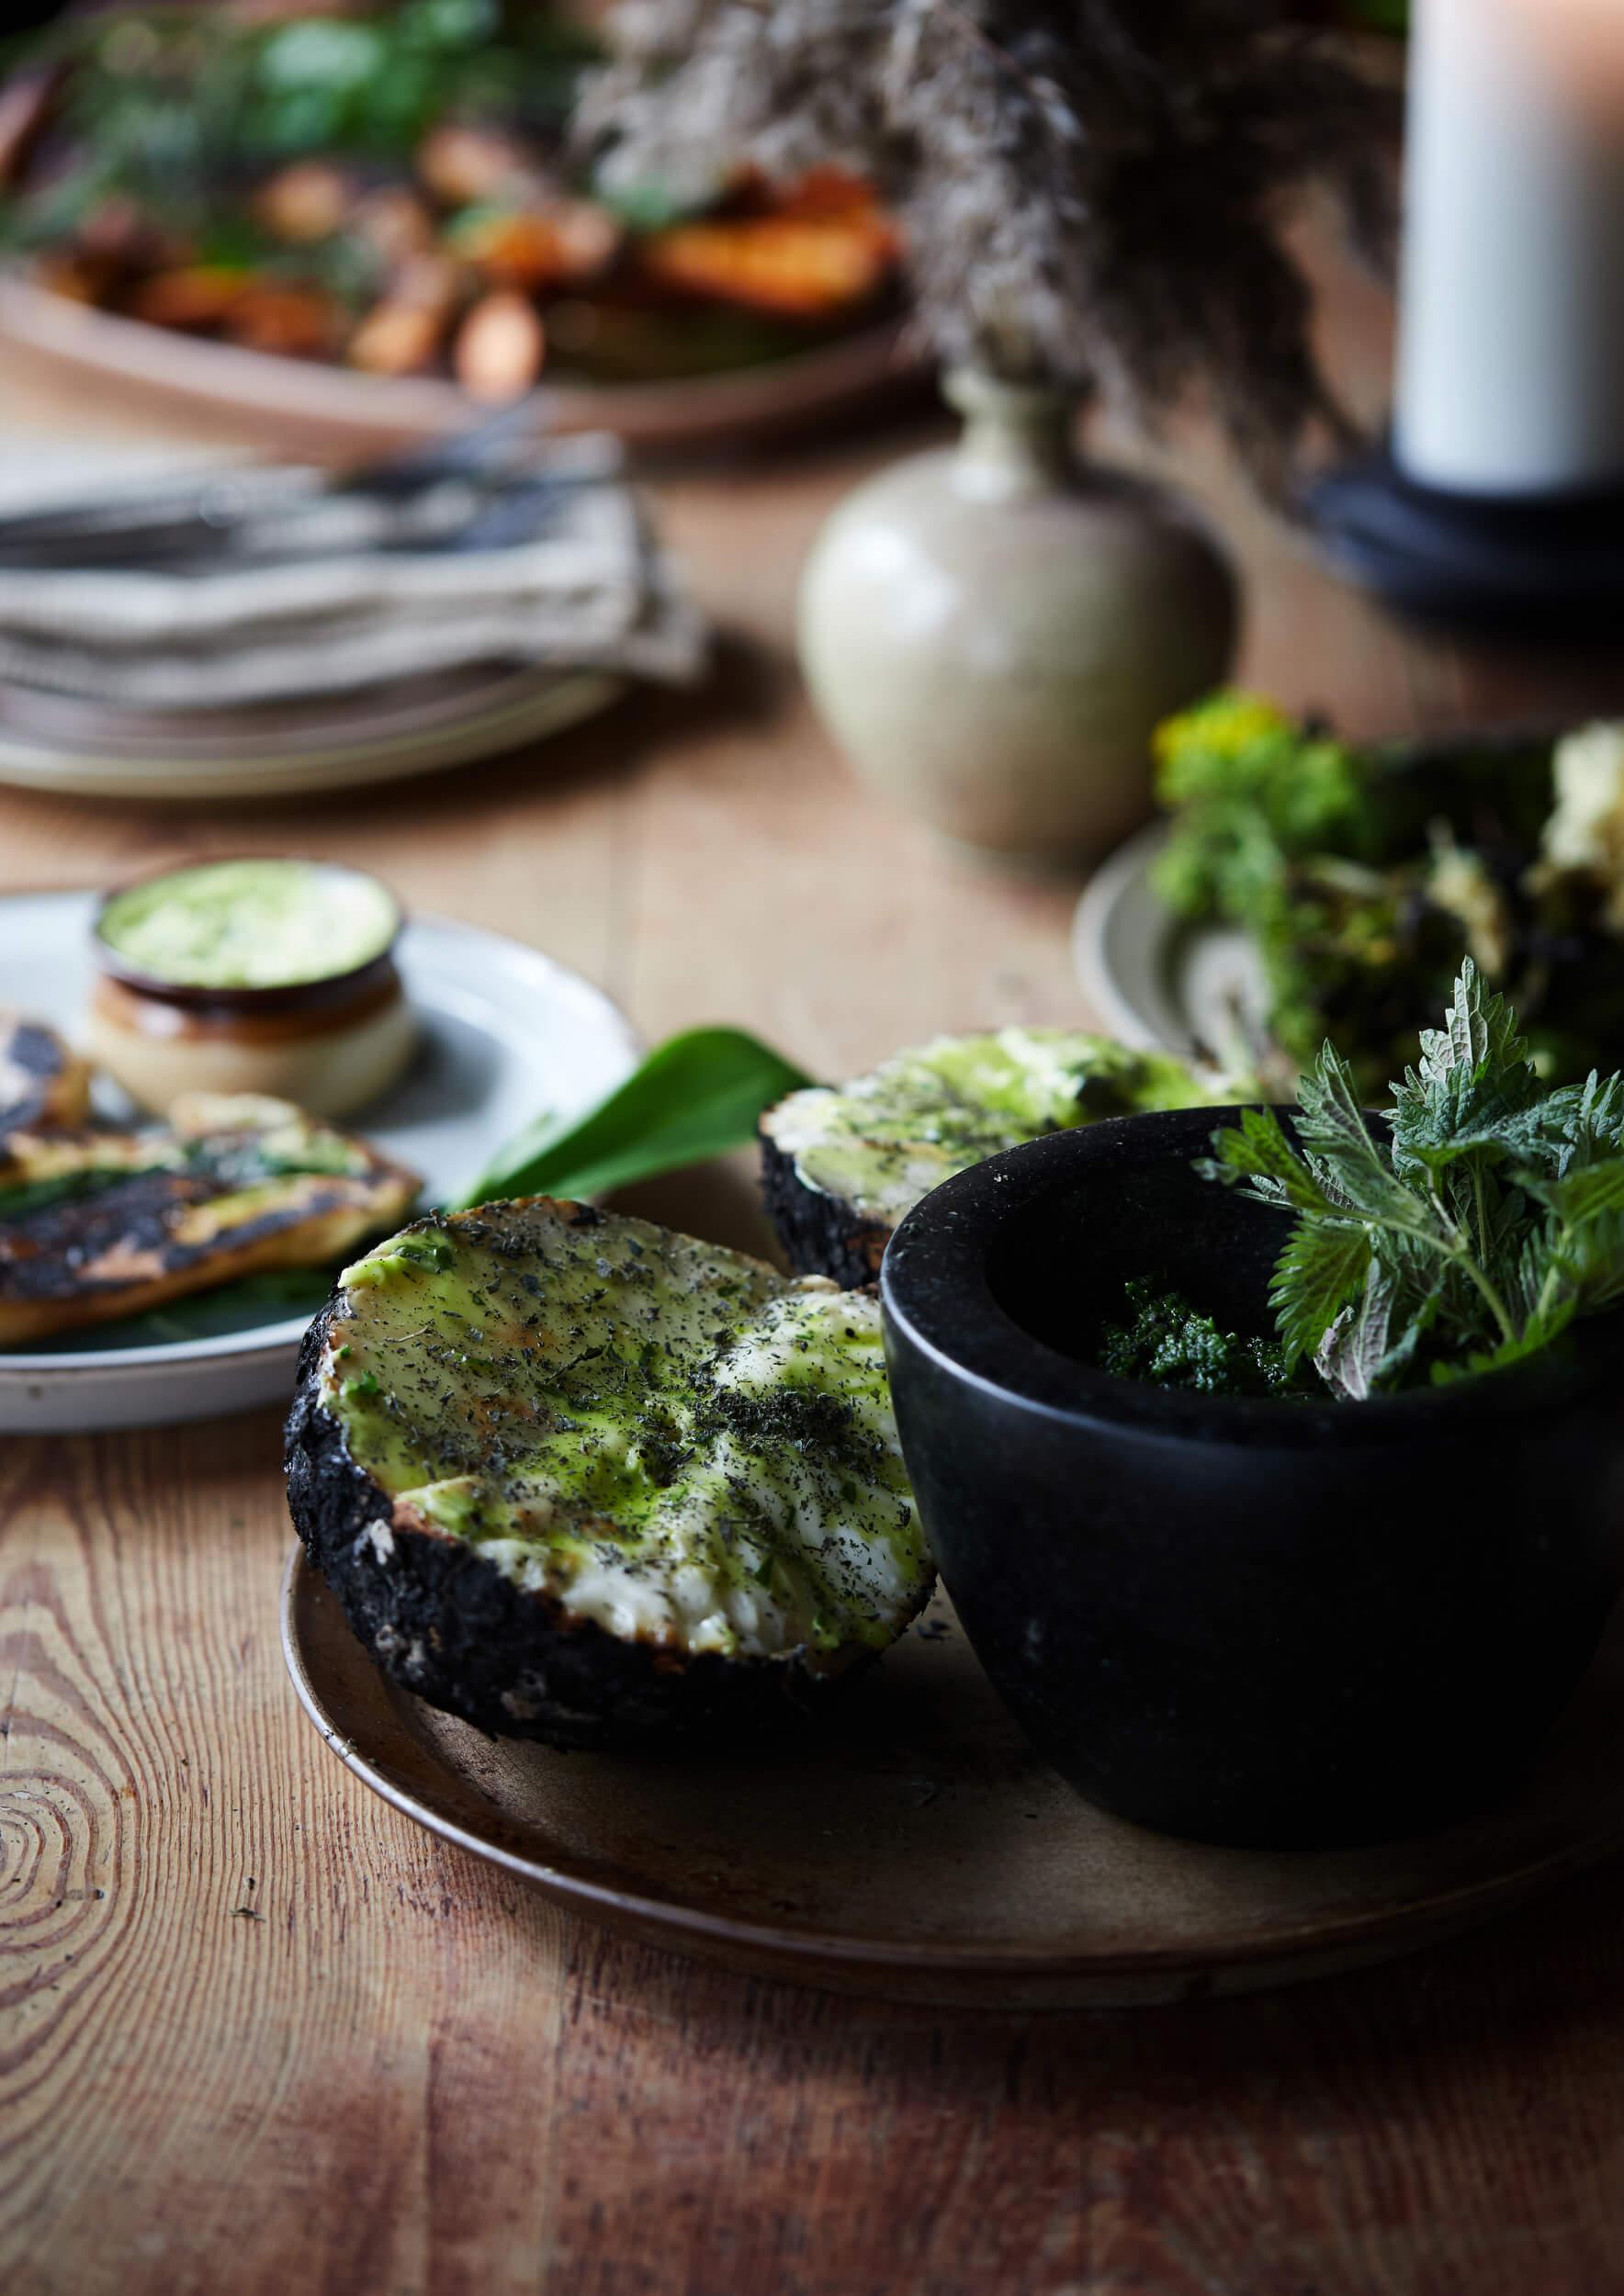 Green dish in Lade 609